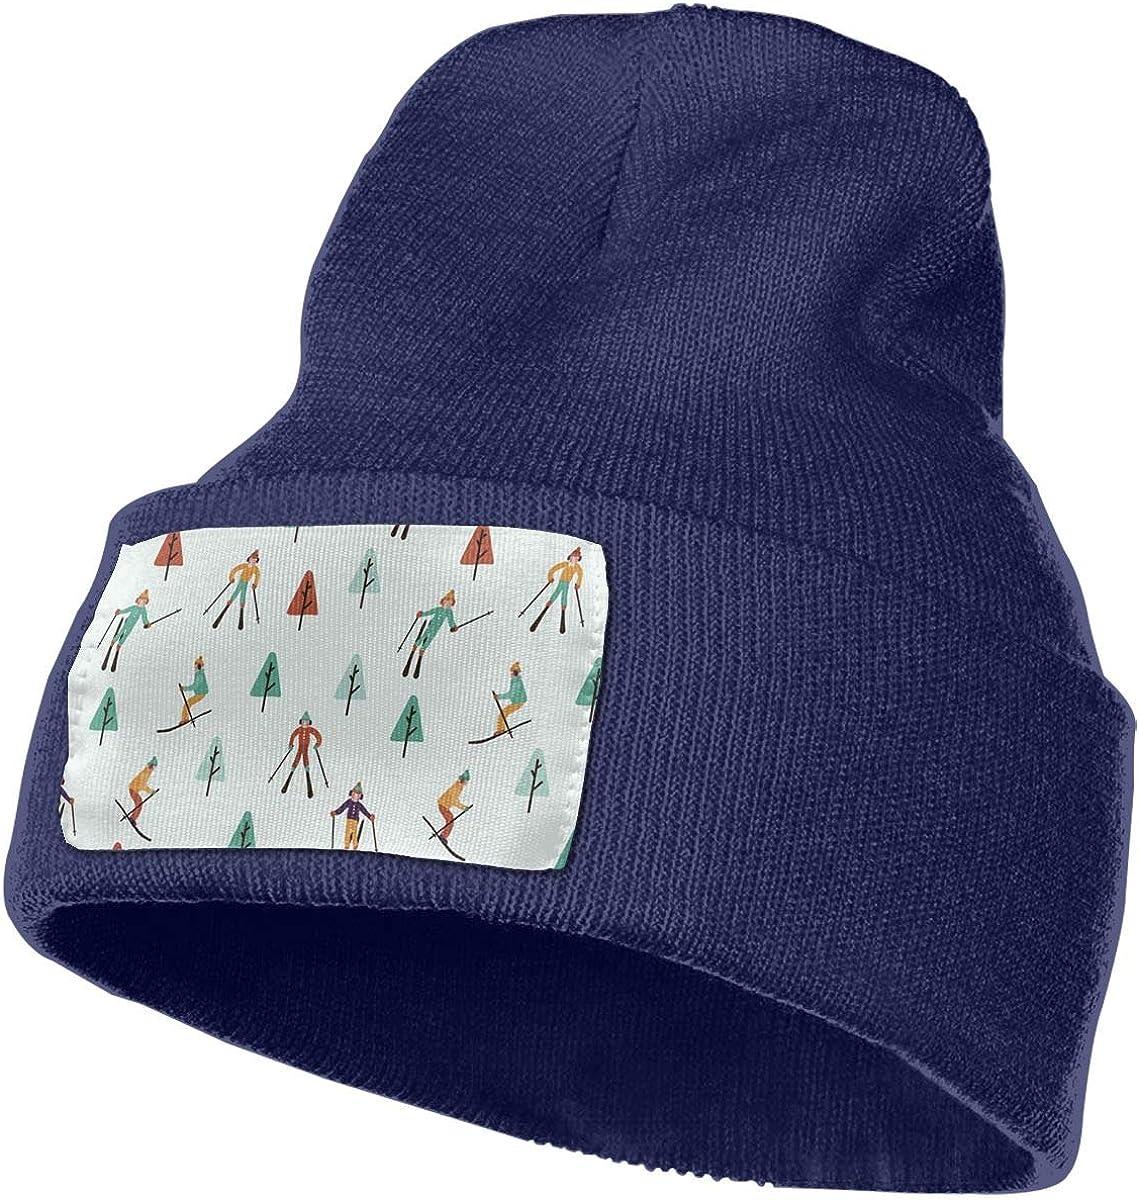 PCaag7v Deer Beanie Hat Winter Solid Warm Knit Unisex Ski Skull Cap